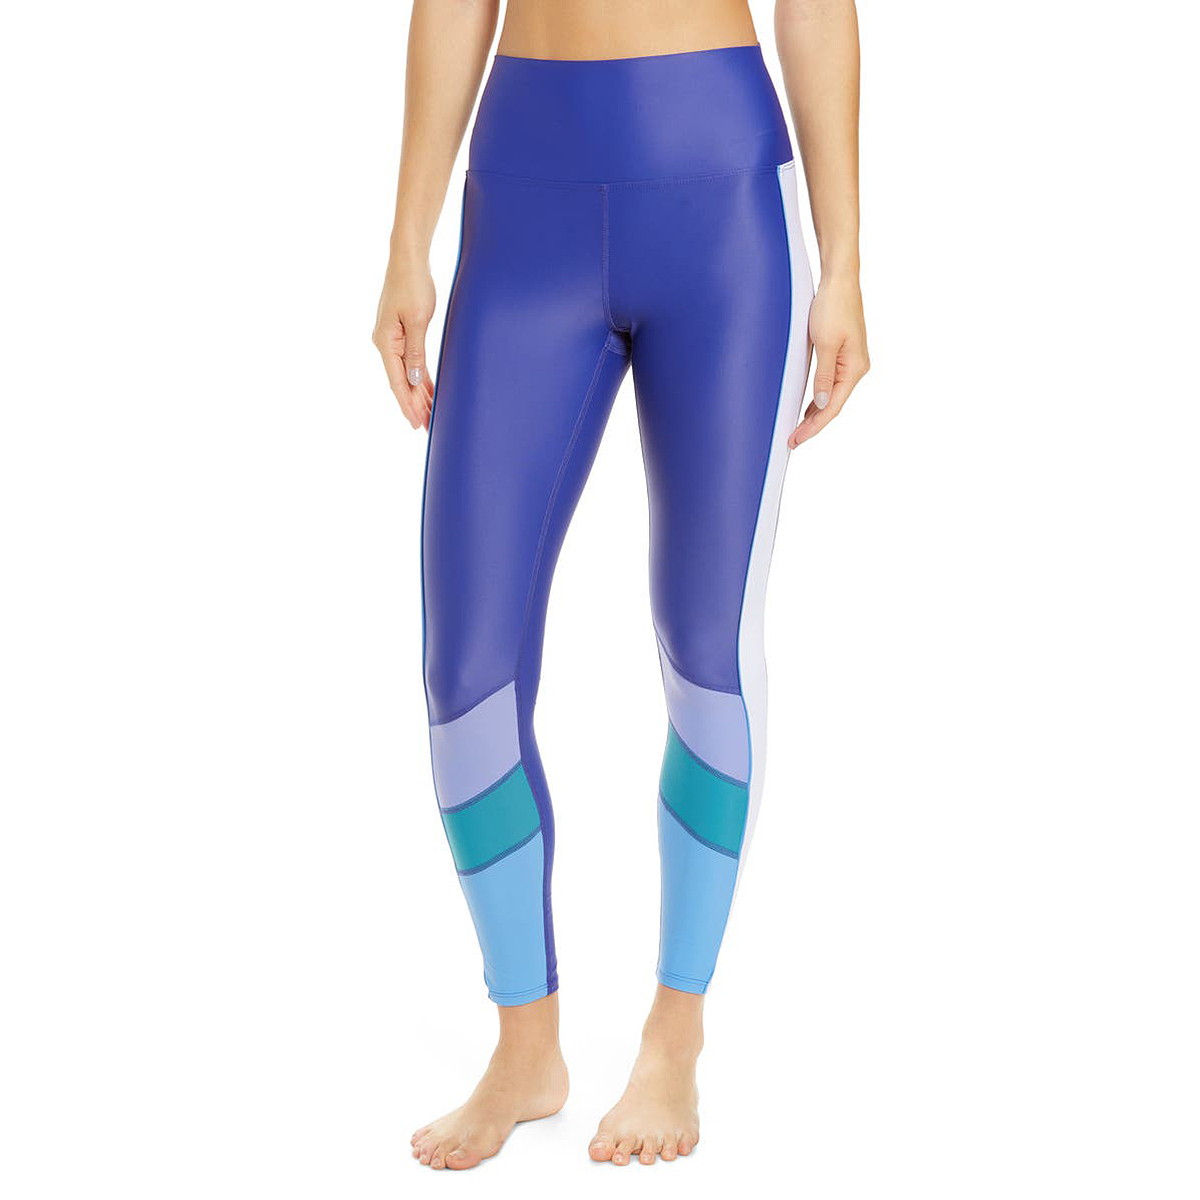 nordstrom-sale-beach-riot-leggings